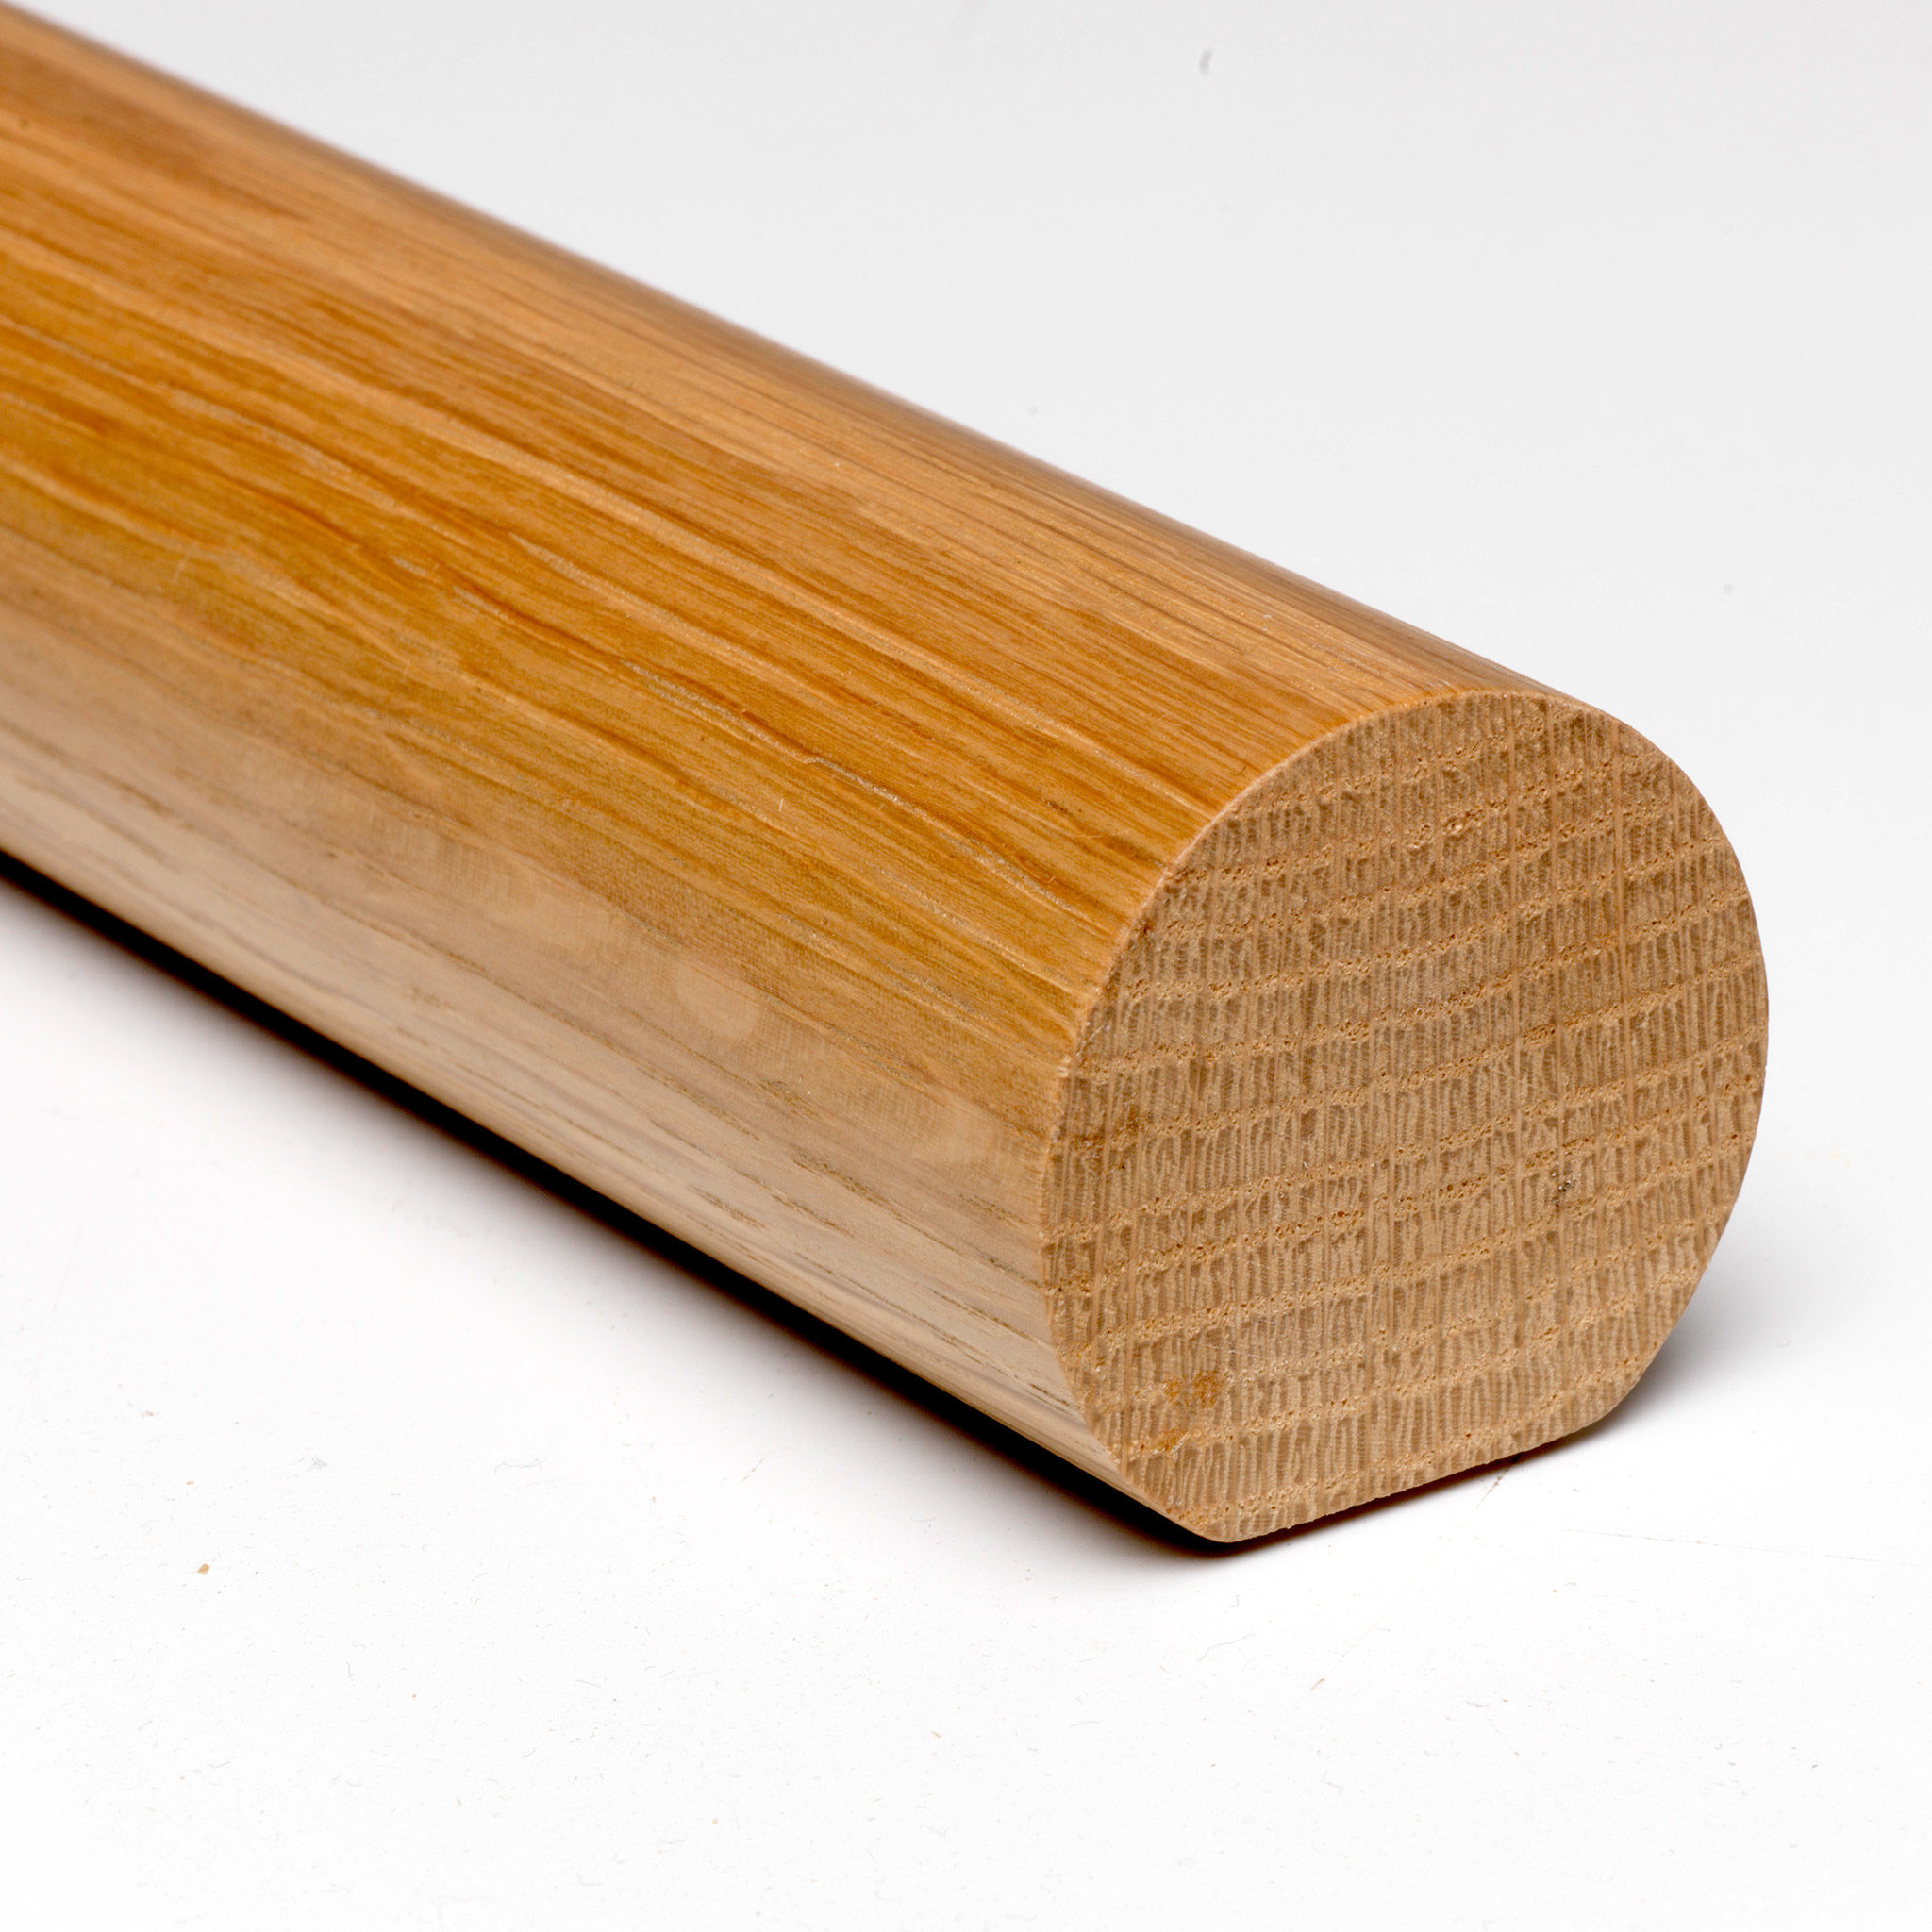 mopstick-handrail